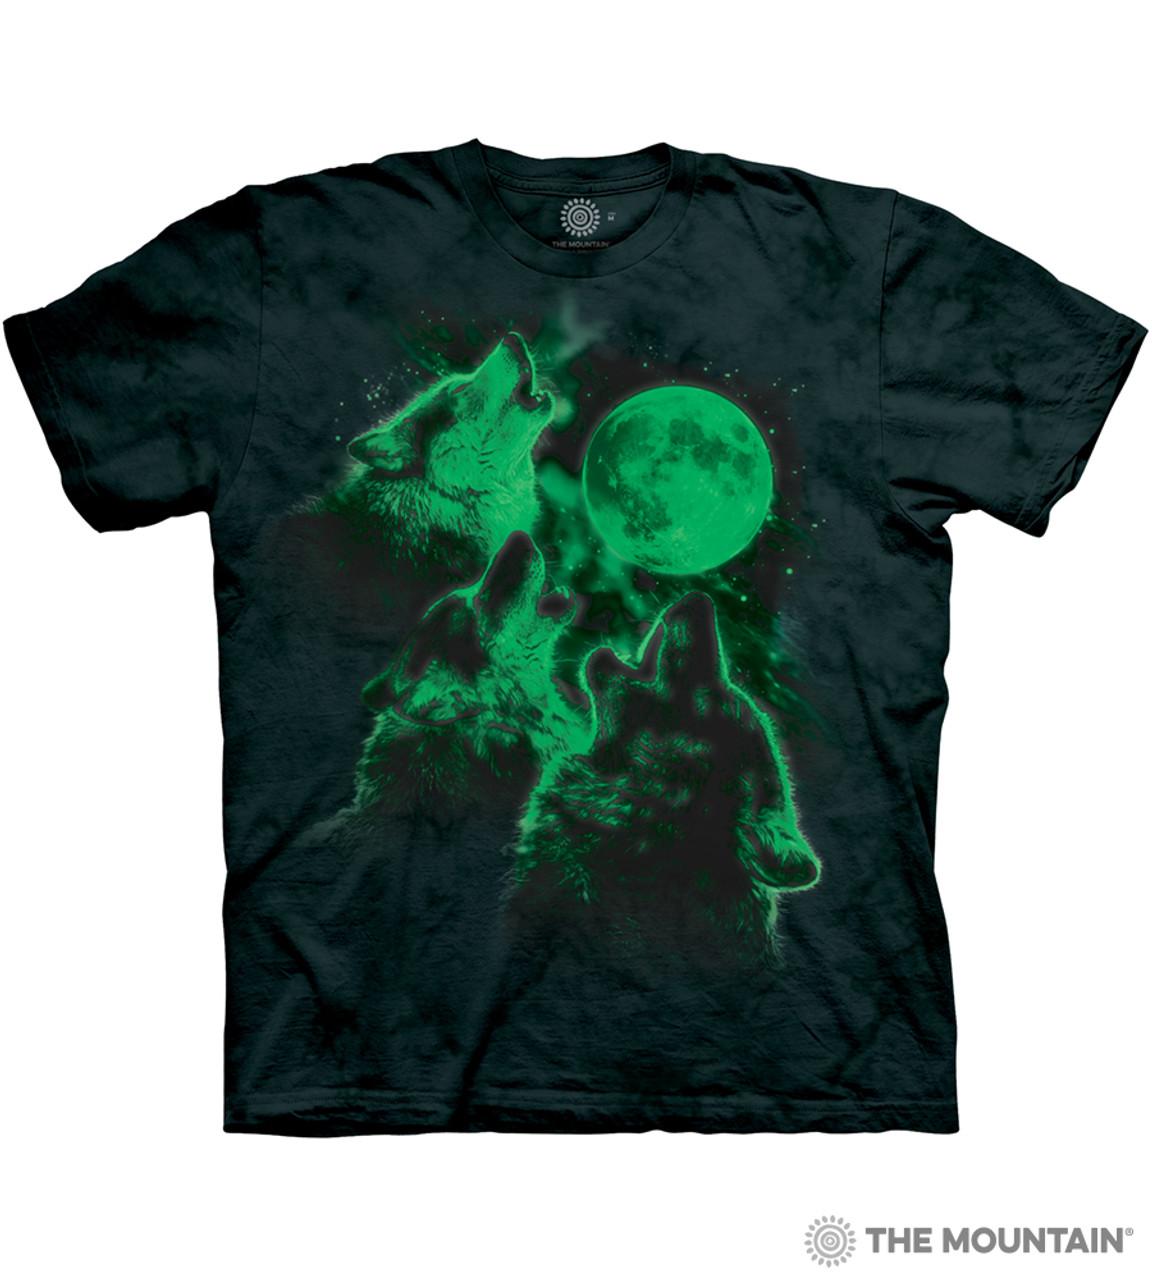 832e667fdd672 The Mountain Adult Unisex T-Shirt - Three Wolf Moon Glow